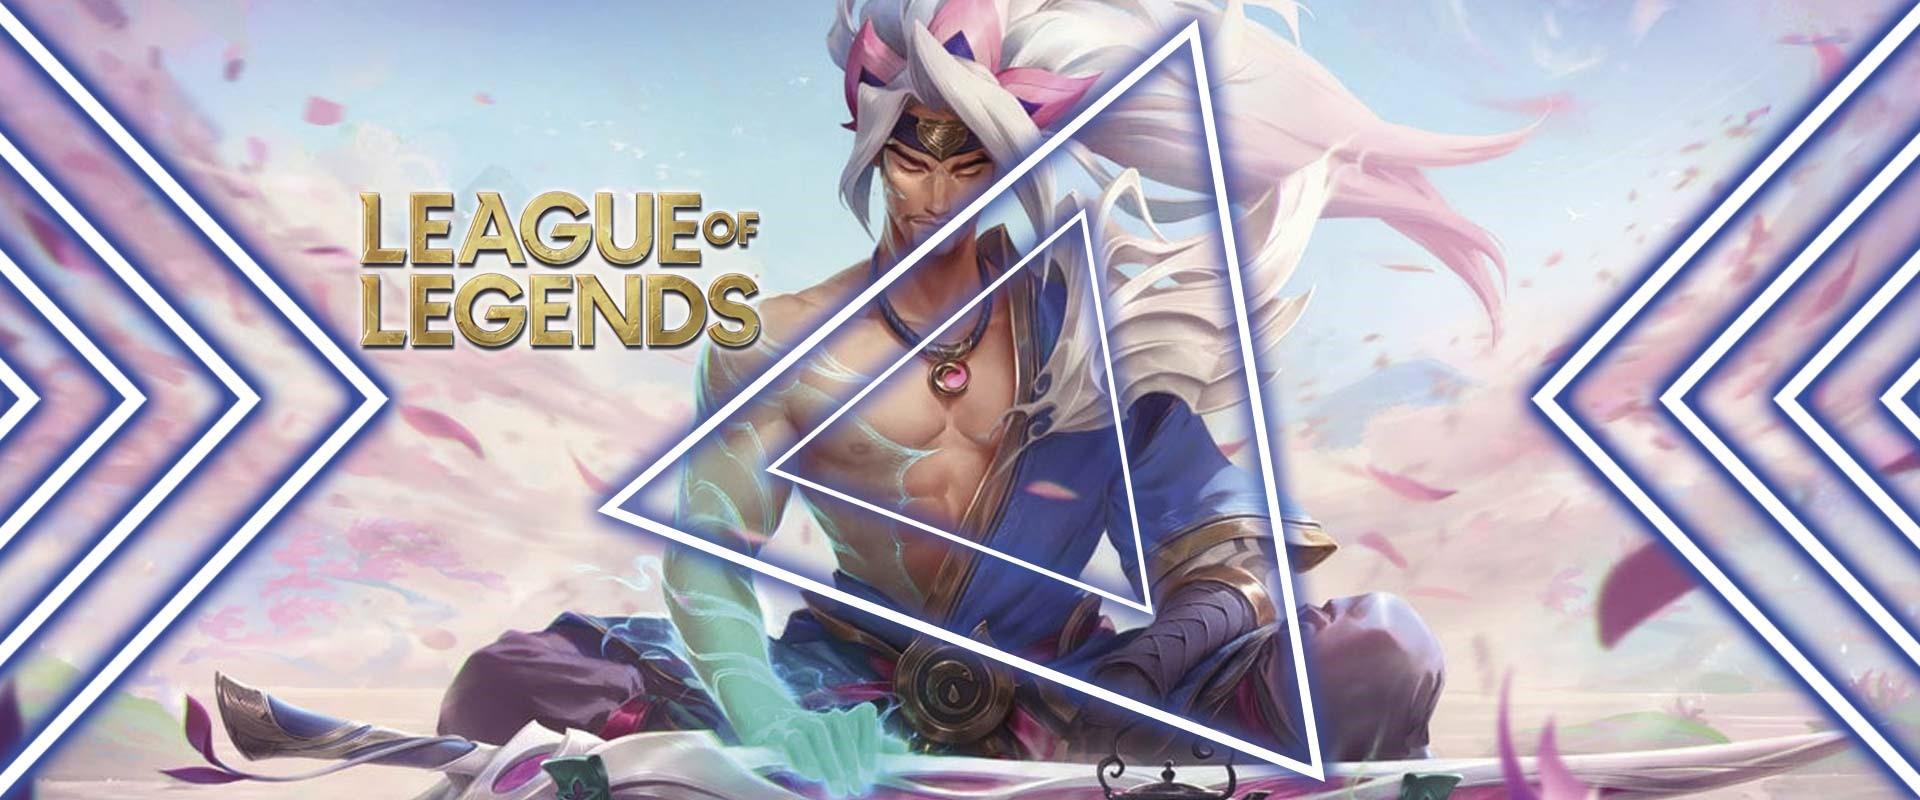 League of Legends  RP %15 İNDİRİM!